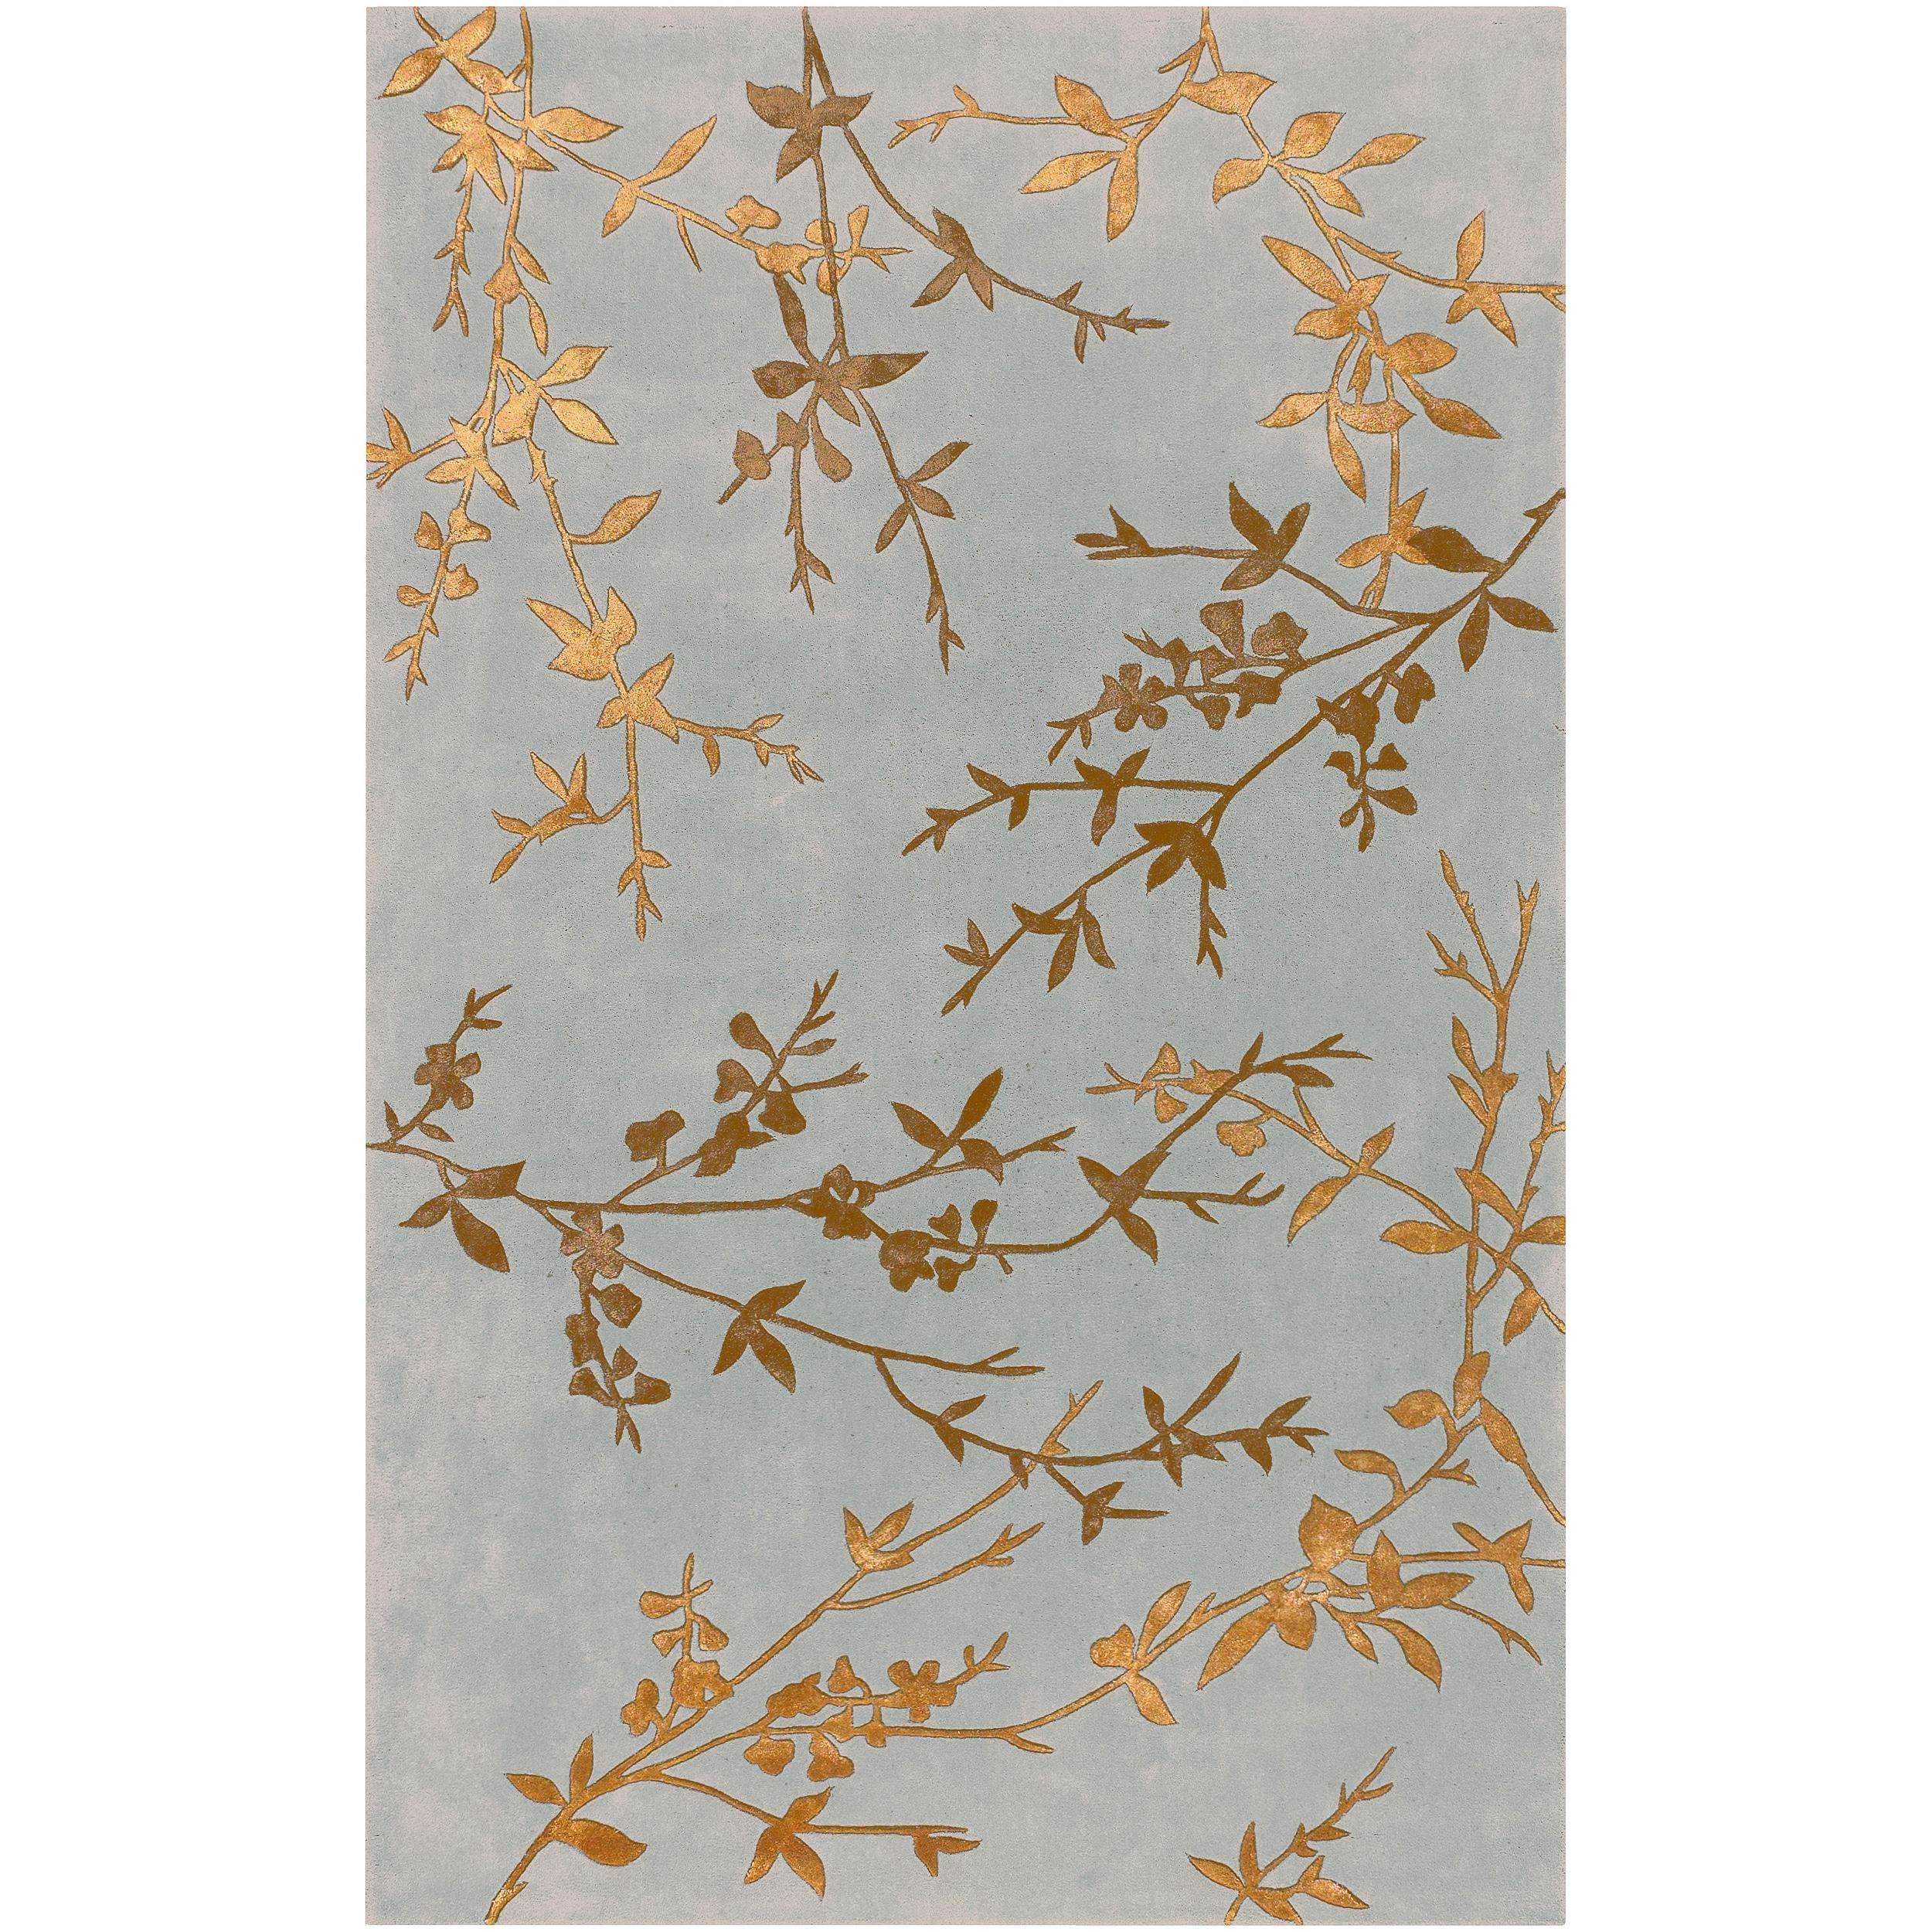 Shop Hand-tufted Brevige Gray Floral Wool Rug